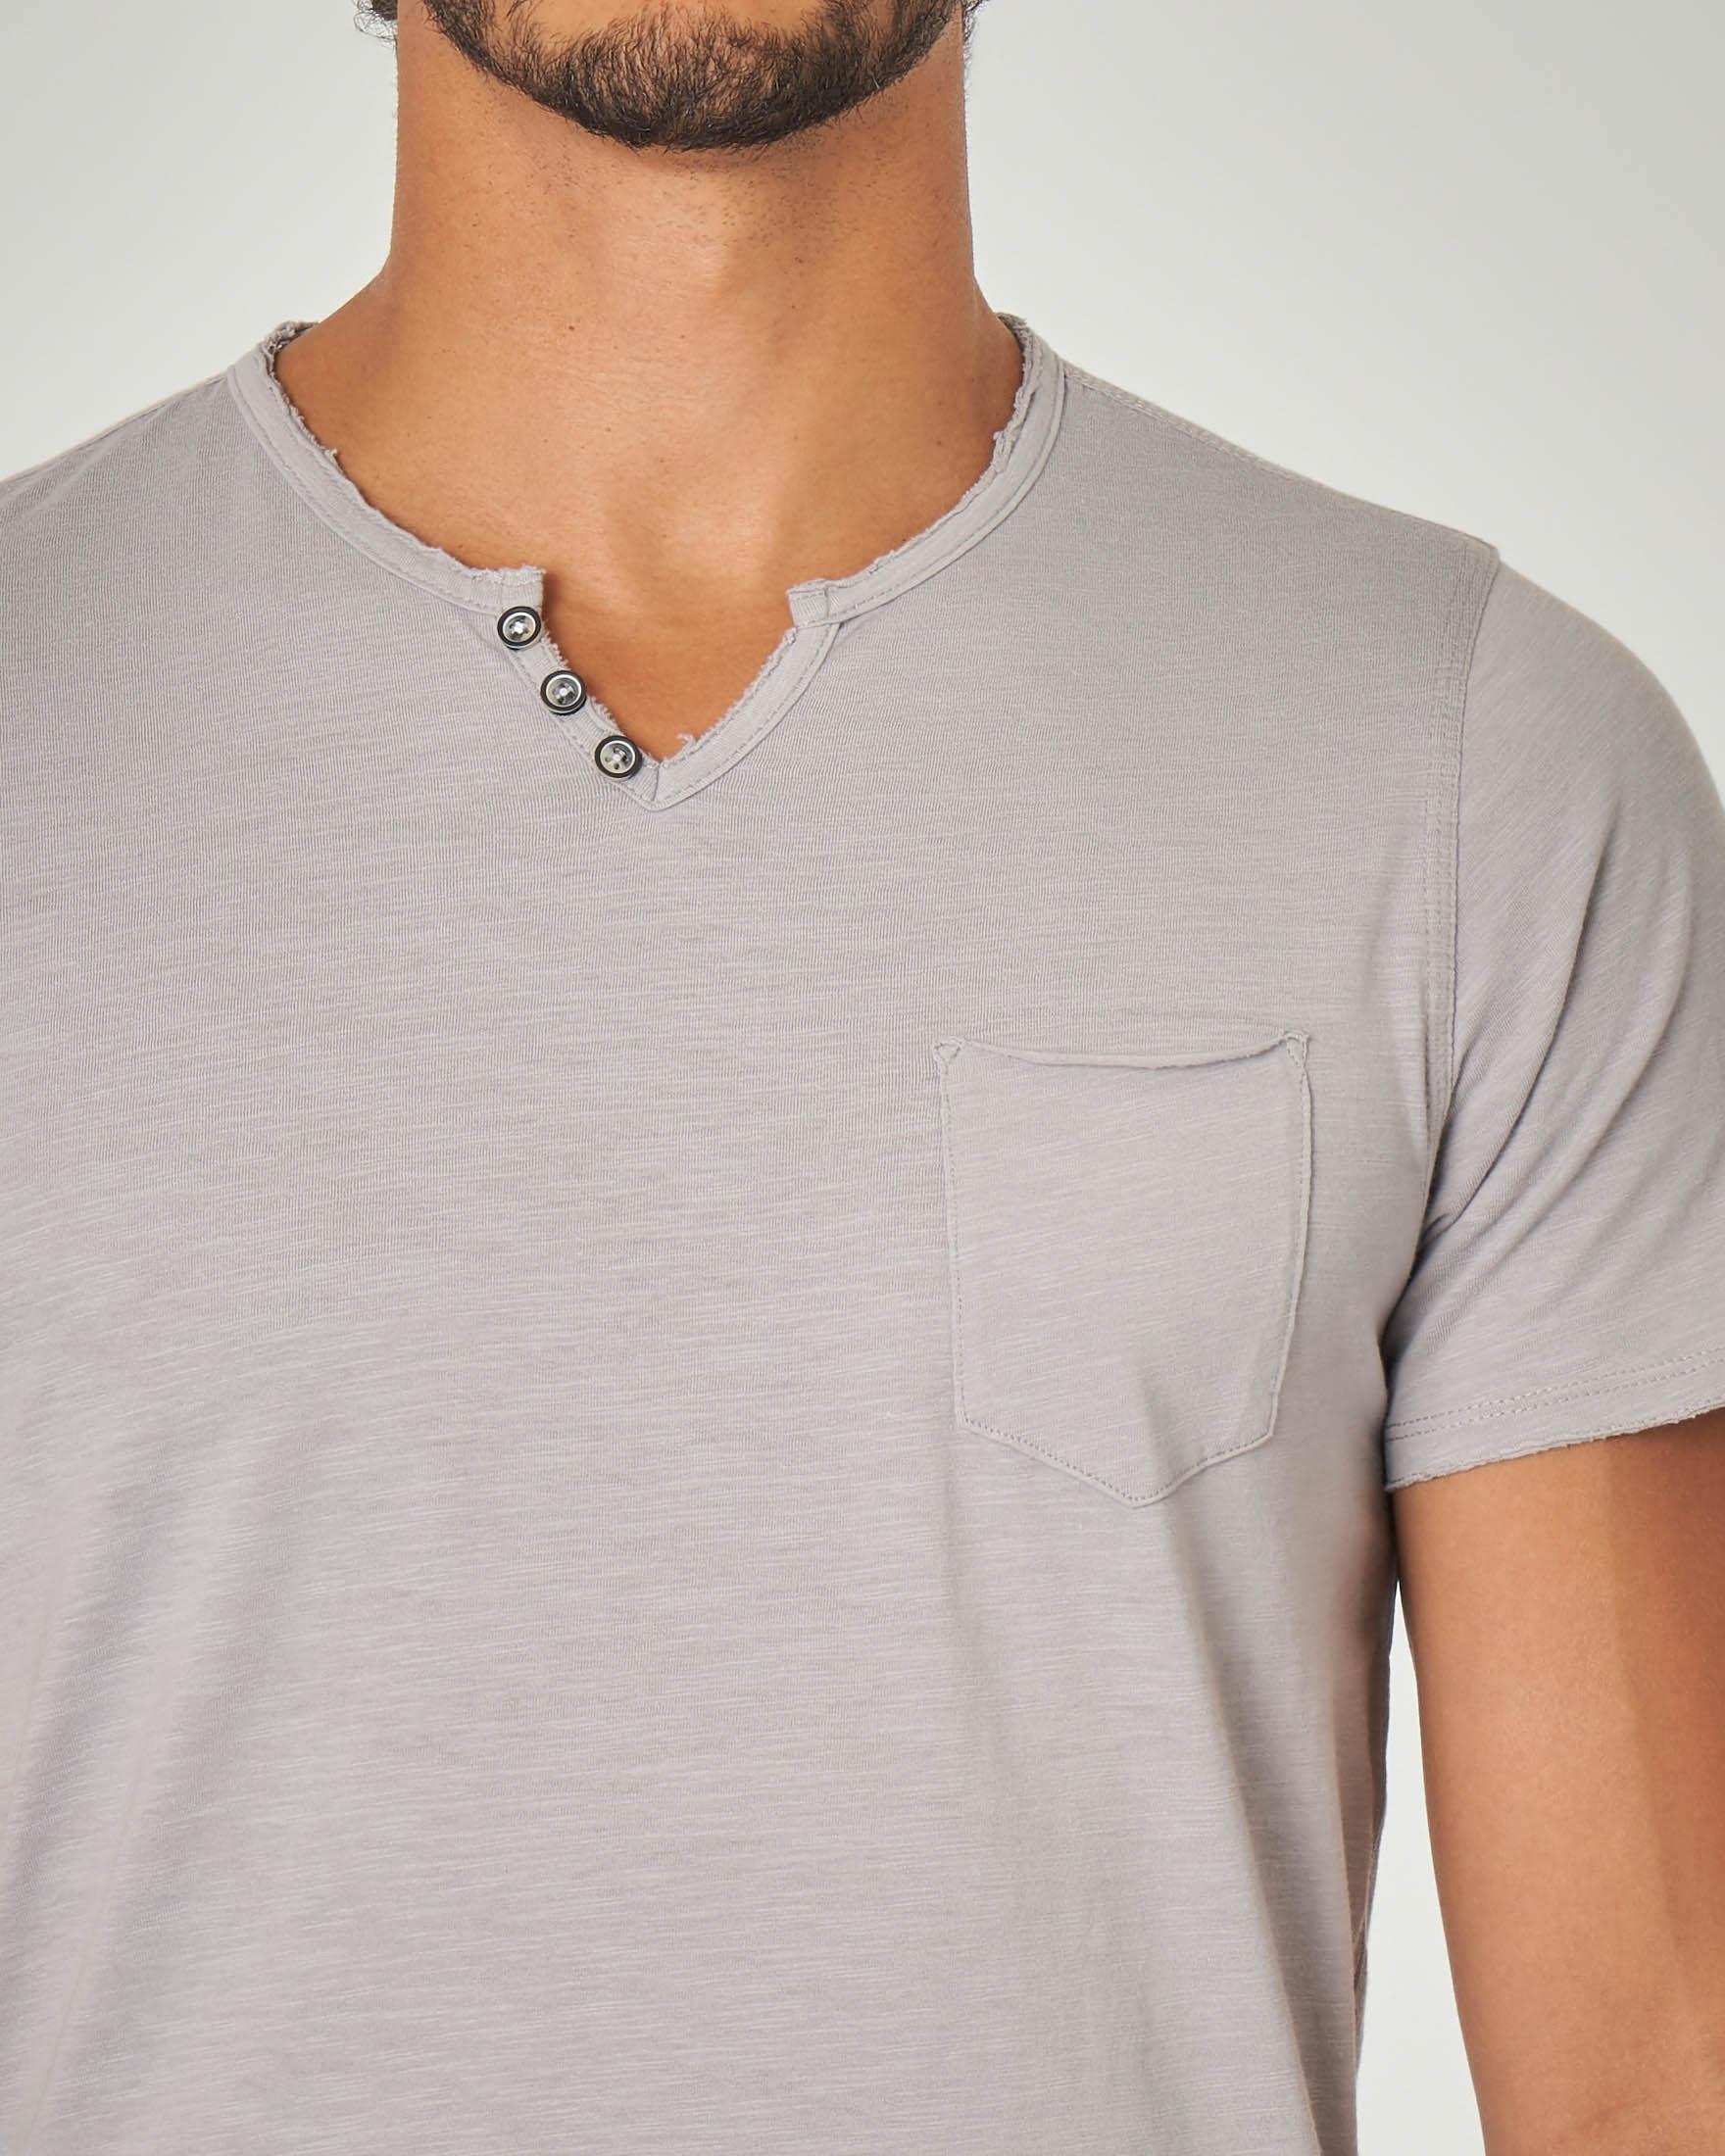 T-shirt grigia serafino con taschino